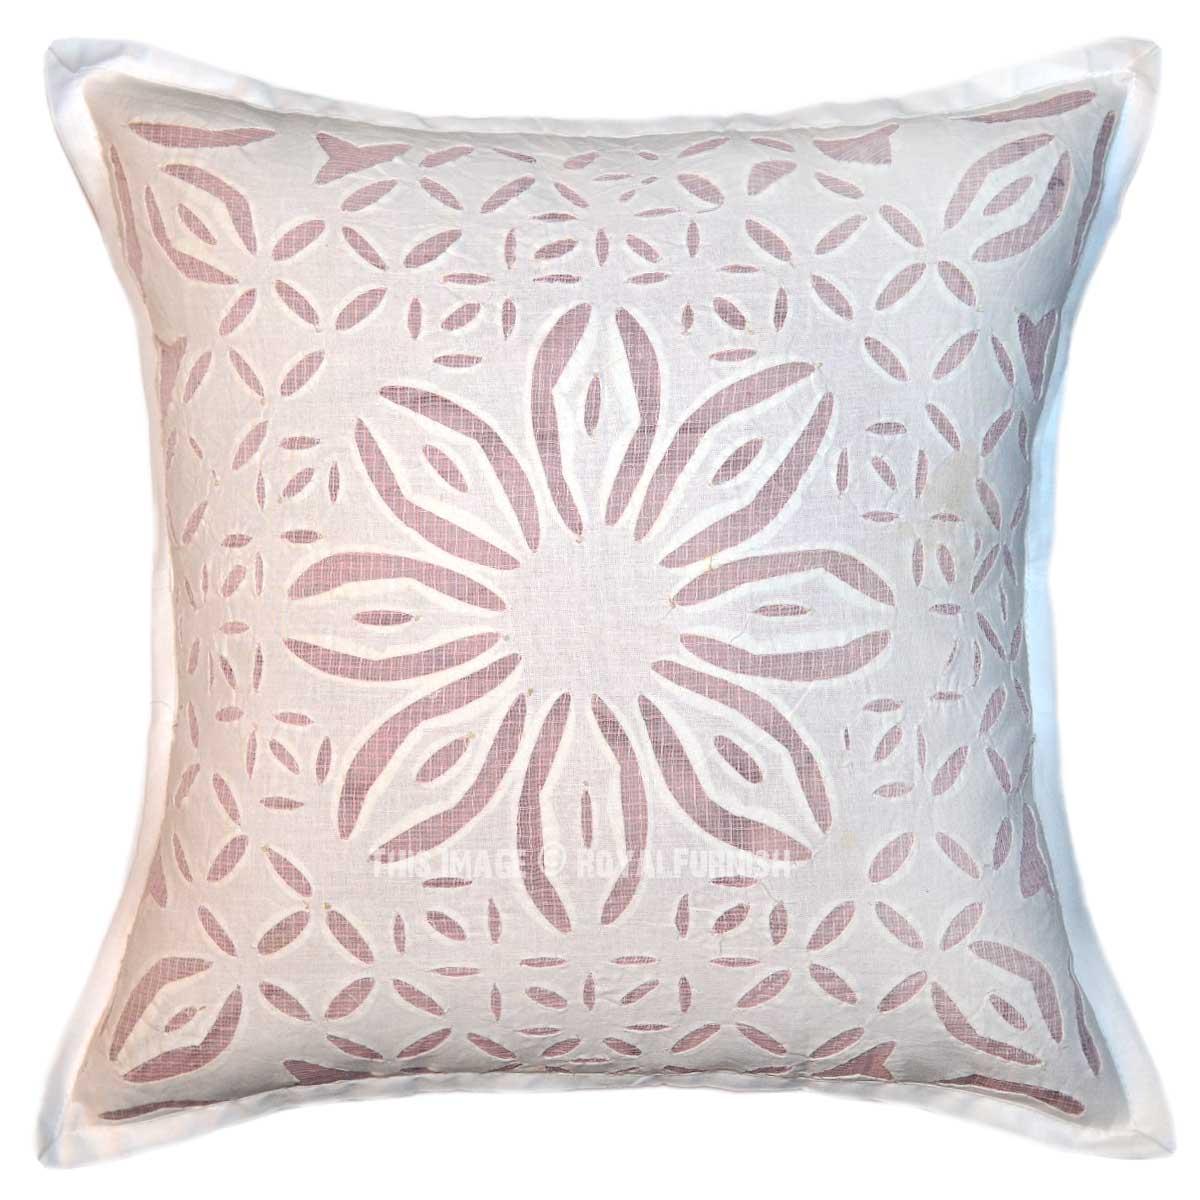 Big Square Decorative Pillows : White Big Flower Hand Cutwork Designer Cotton Square Pillow Cover 16X16 - RoyalFurnish.com